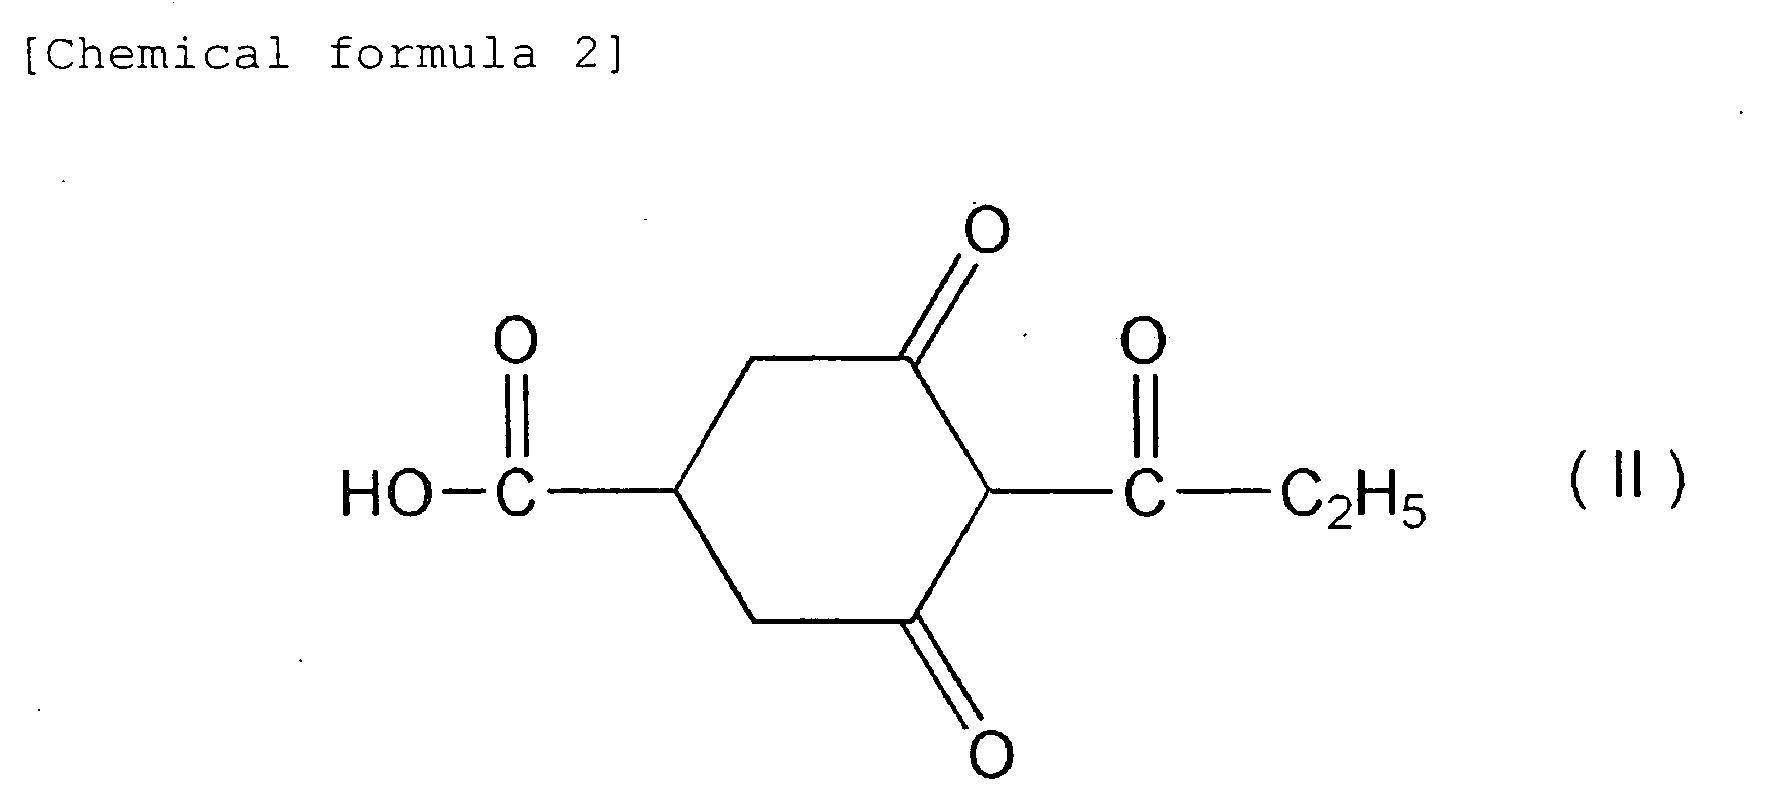 Salt chemistry chemical formula for salt s pinterest salt chemistry chemical formula for salt pooptronica